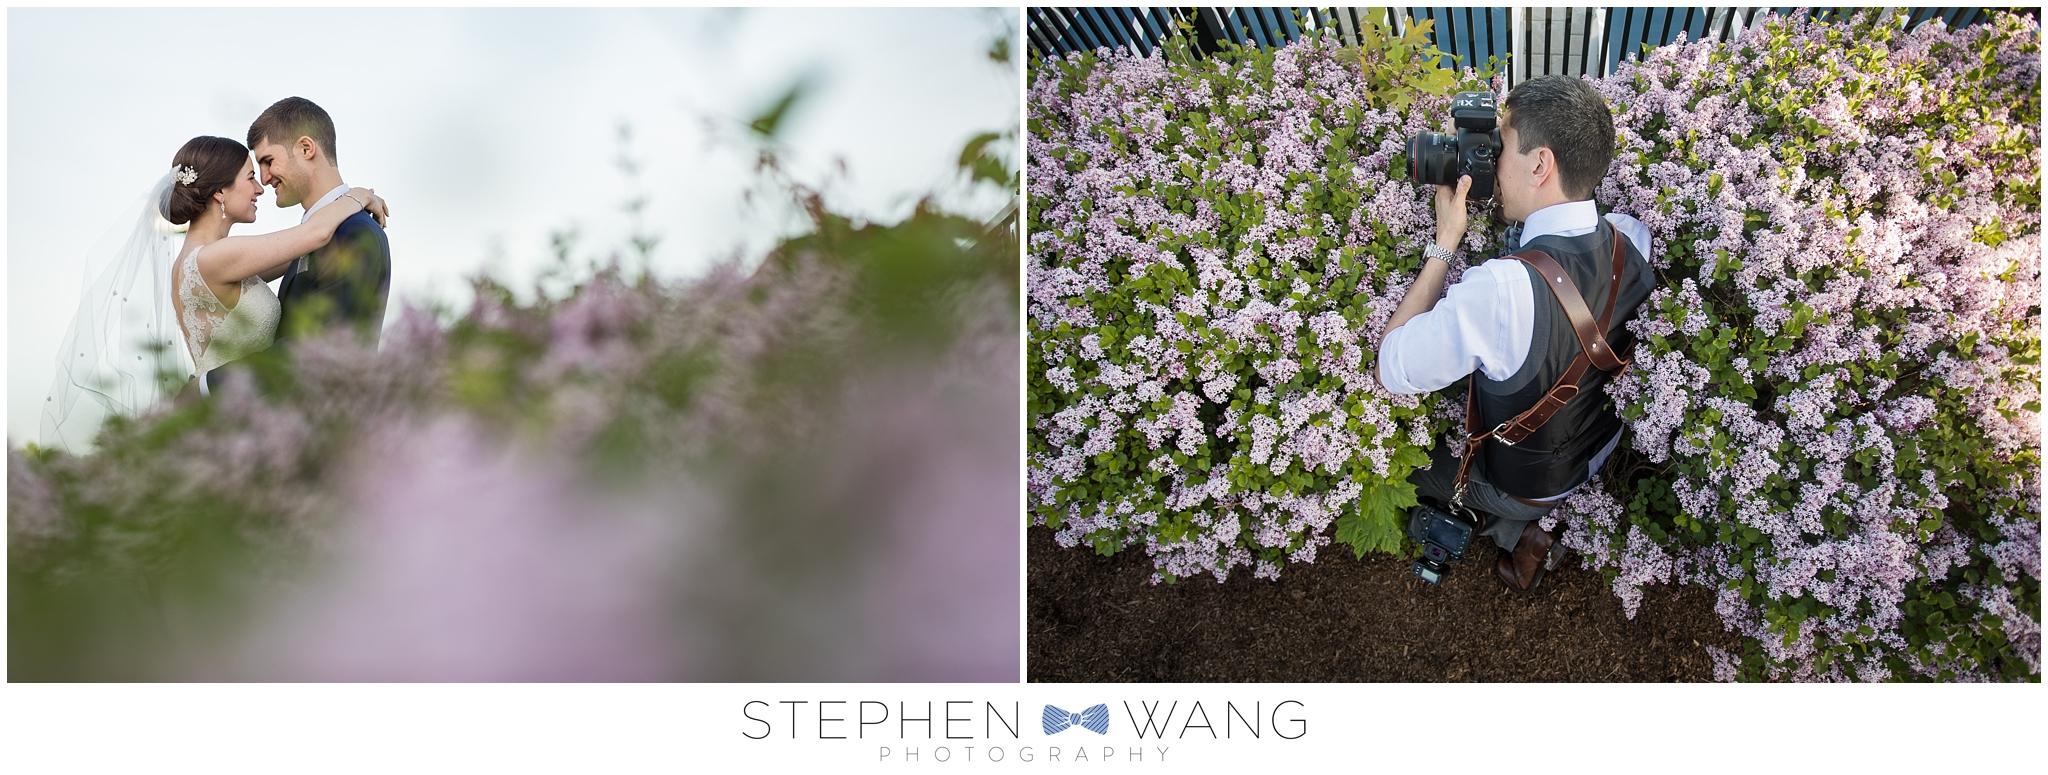 Stephen Wang Photography Shorehaven Norwalk CT Wedding Photographer connecticut shoreline shore haven - 27.jpg